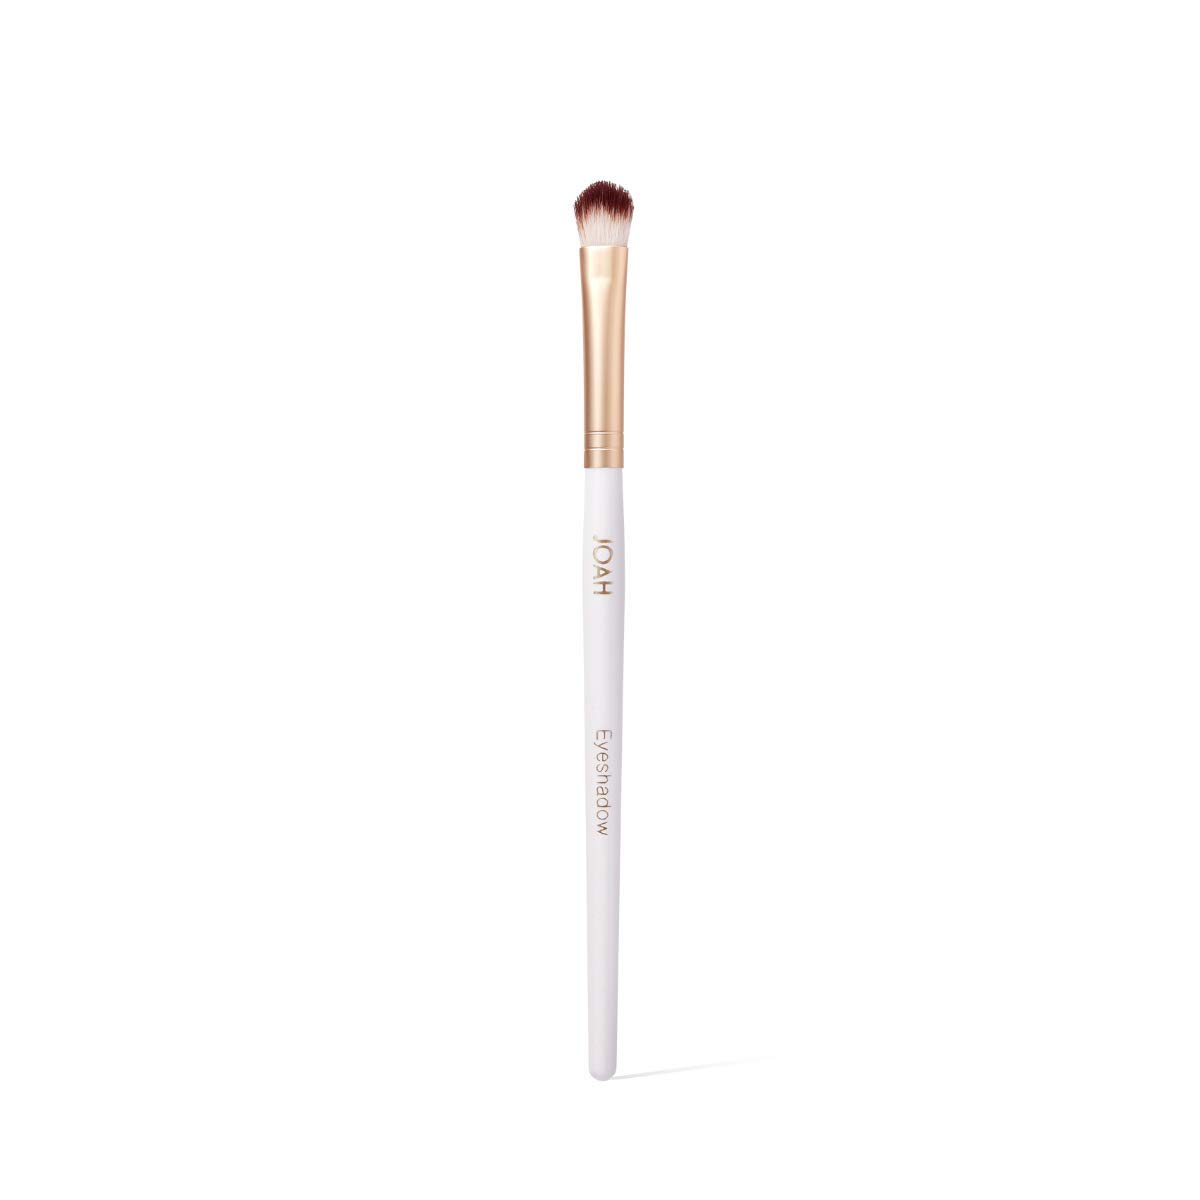 JOAH Eyeshadow Wholesale Overseas parallel import regular item Brush